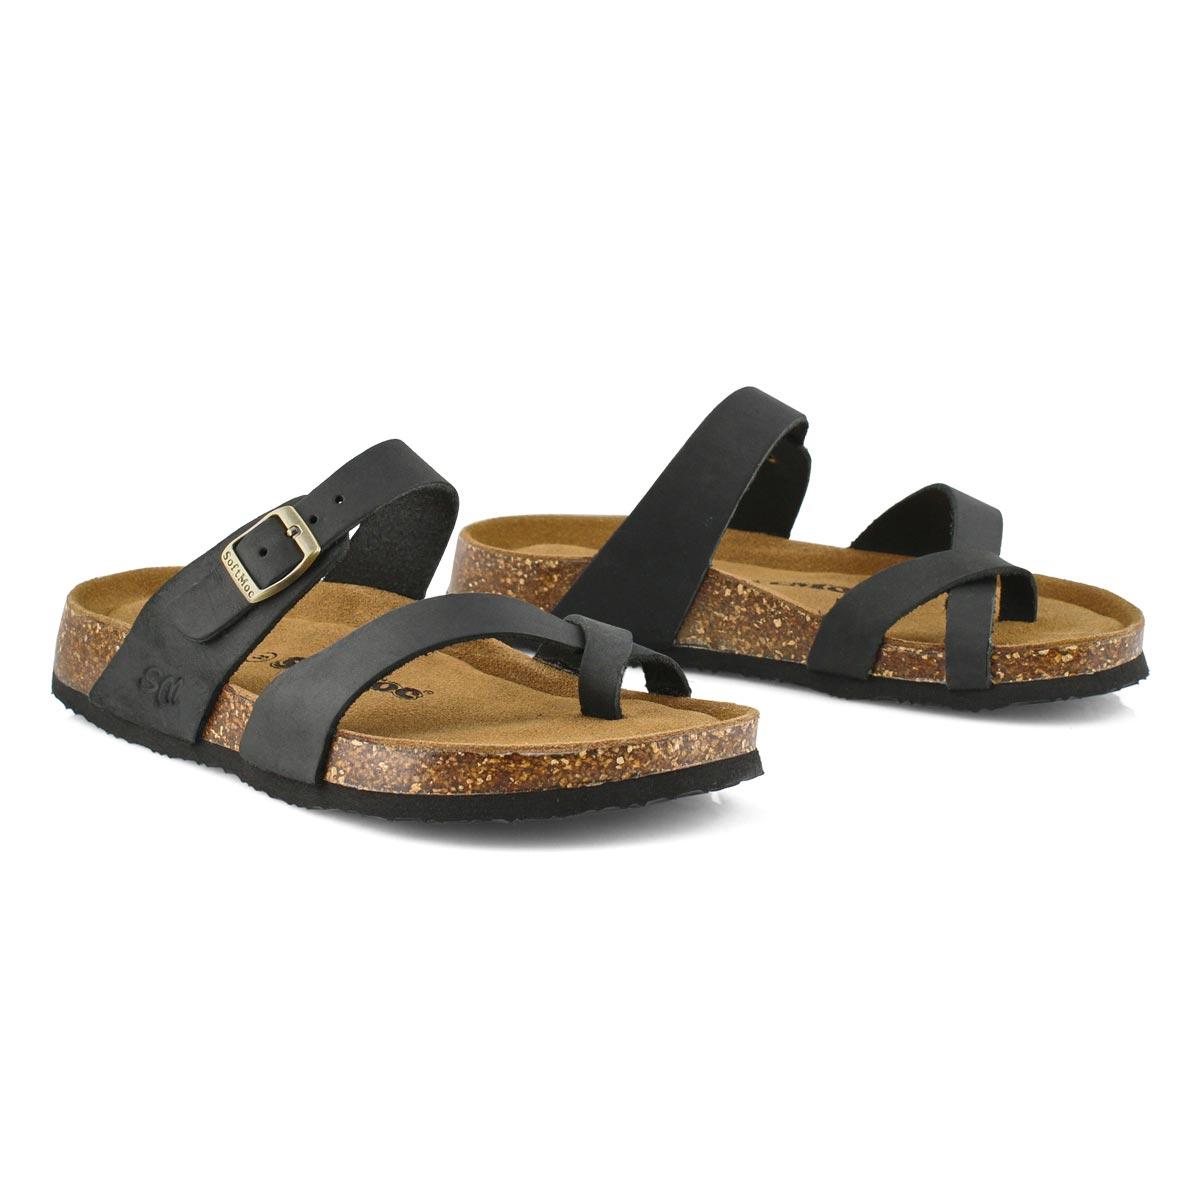 Lds Alicia 5 blk crz memory foam sandal